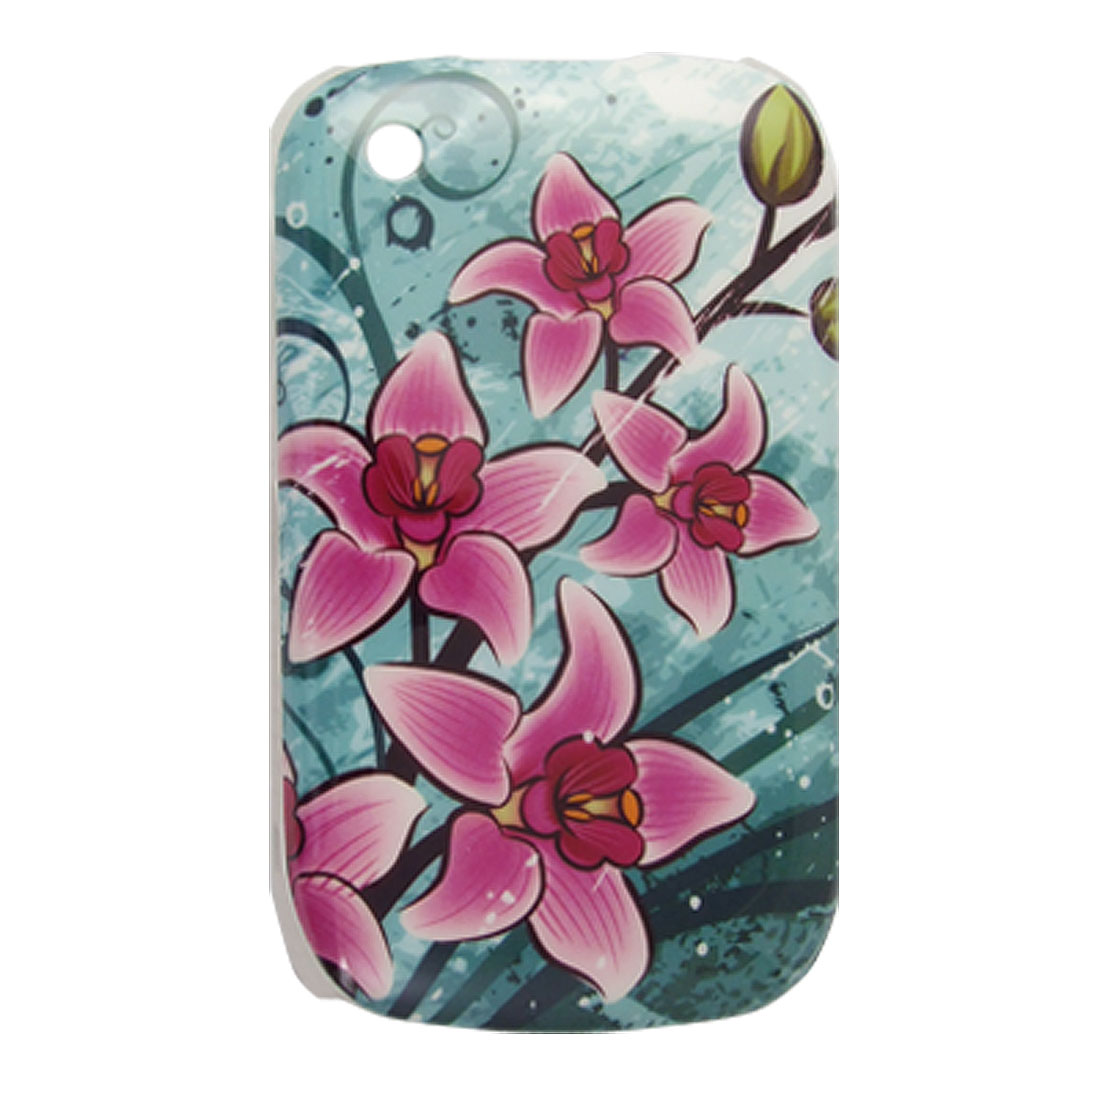 IMD Purple Flowers Hard Plastic Back Case for Blackberry Curve 8520